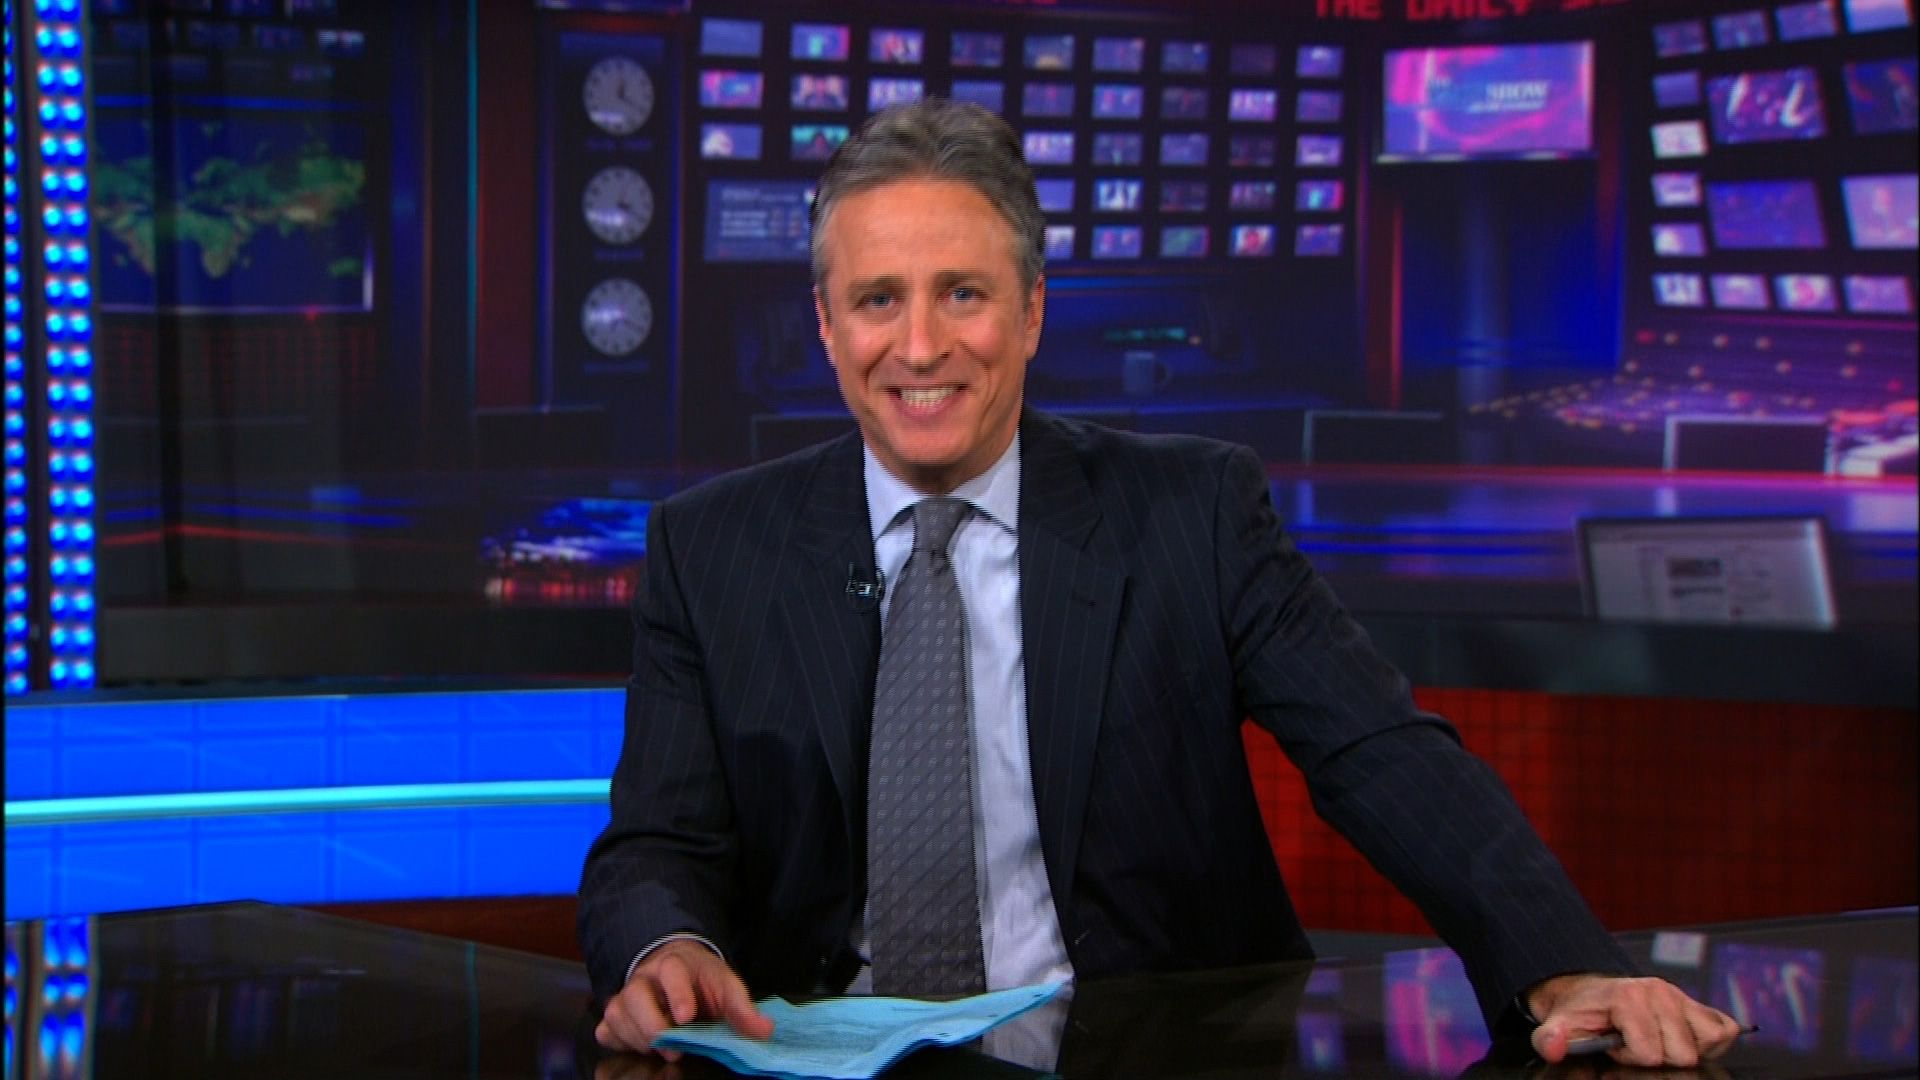 John Edwards Affair - The Daily Show with Jon Stewart   Comedy Central